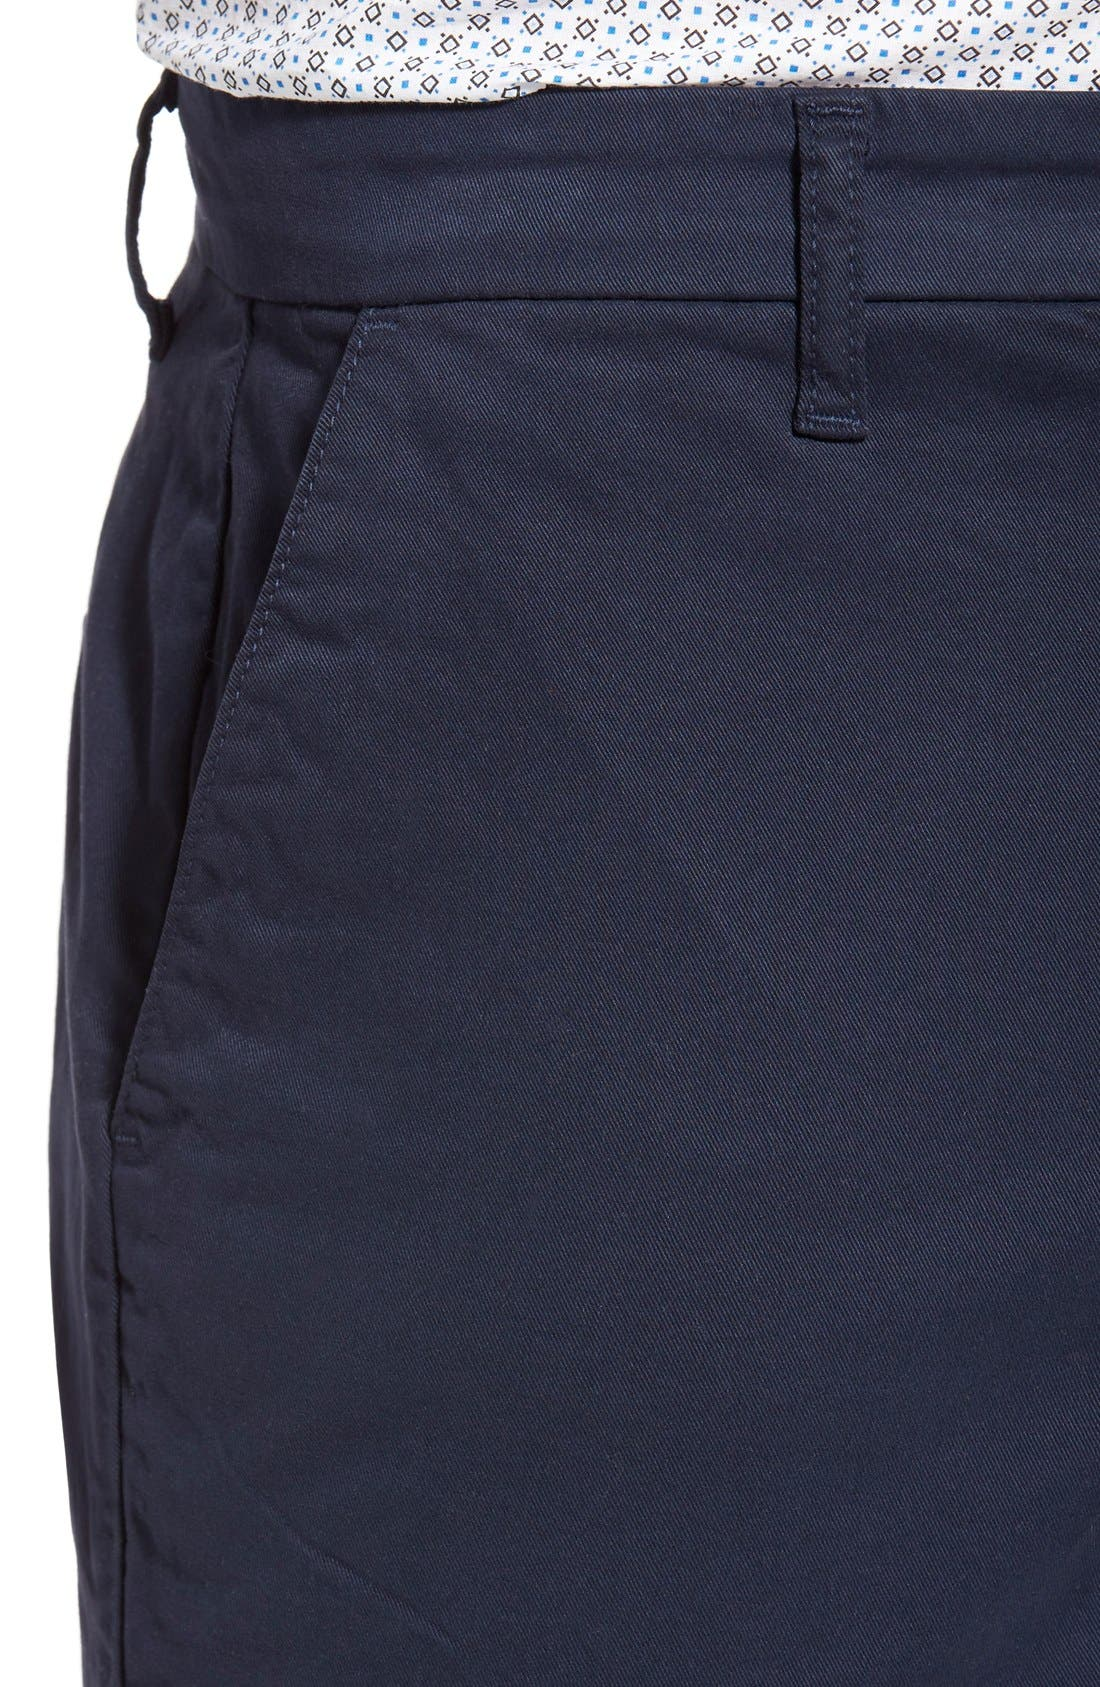 'Thompson' Slim Fit Shorts,                             Alternate thumbnail 4, color,                             Navy Cadet